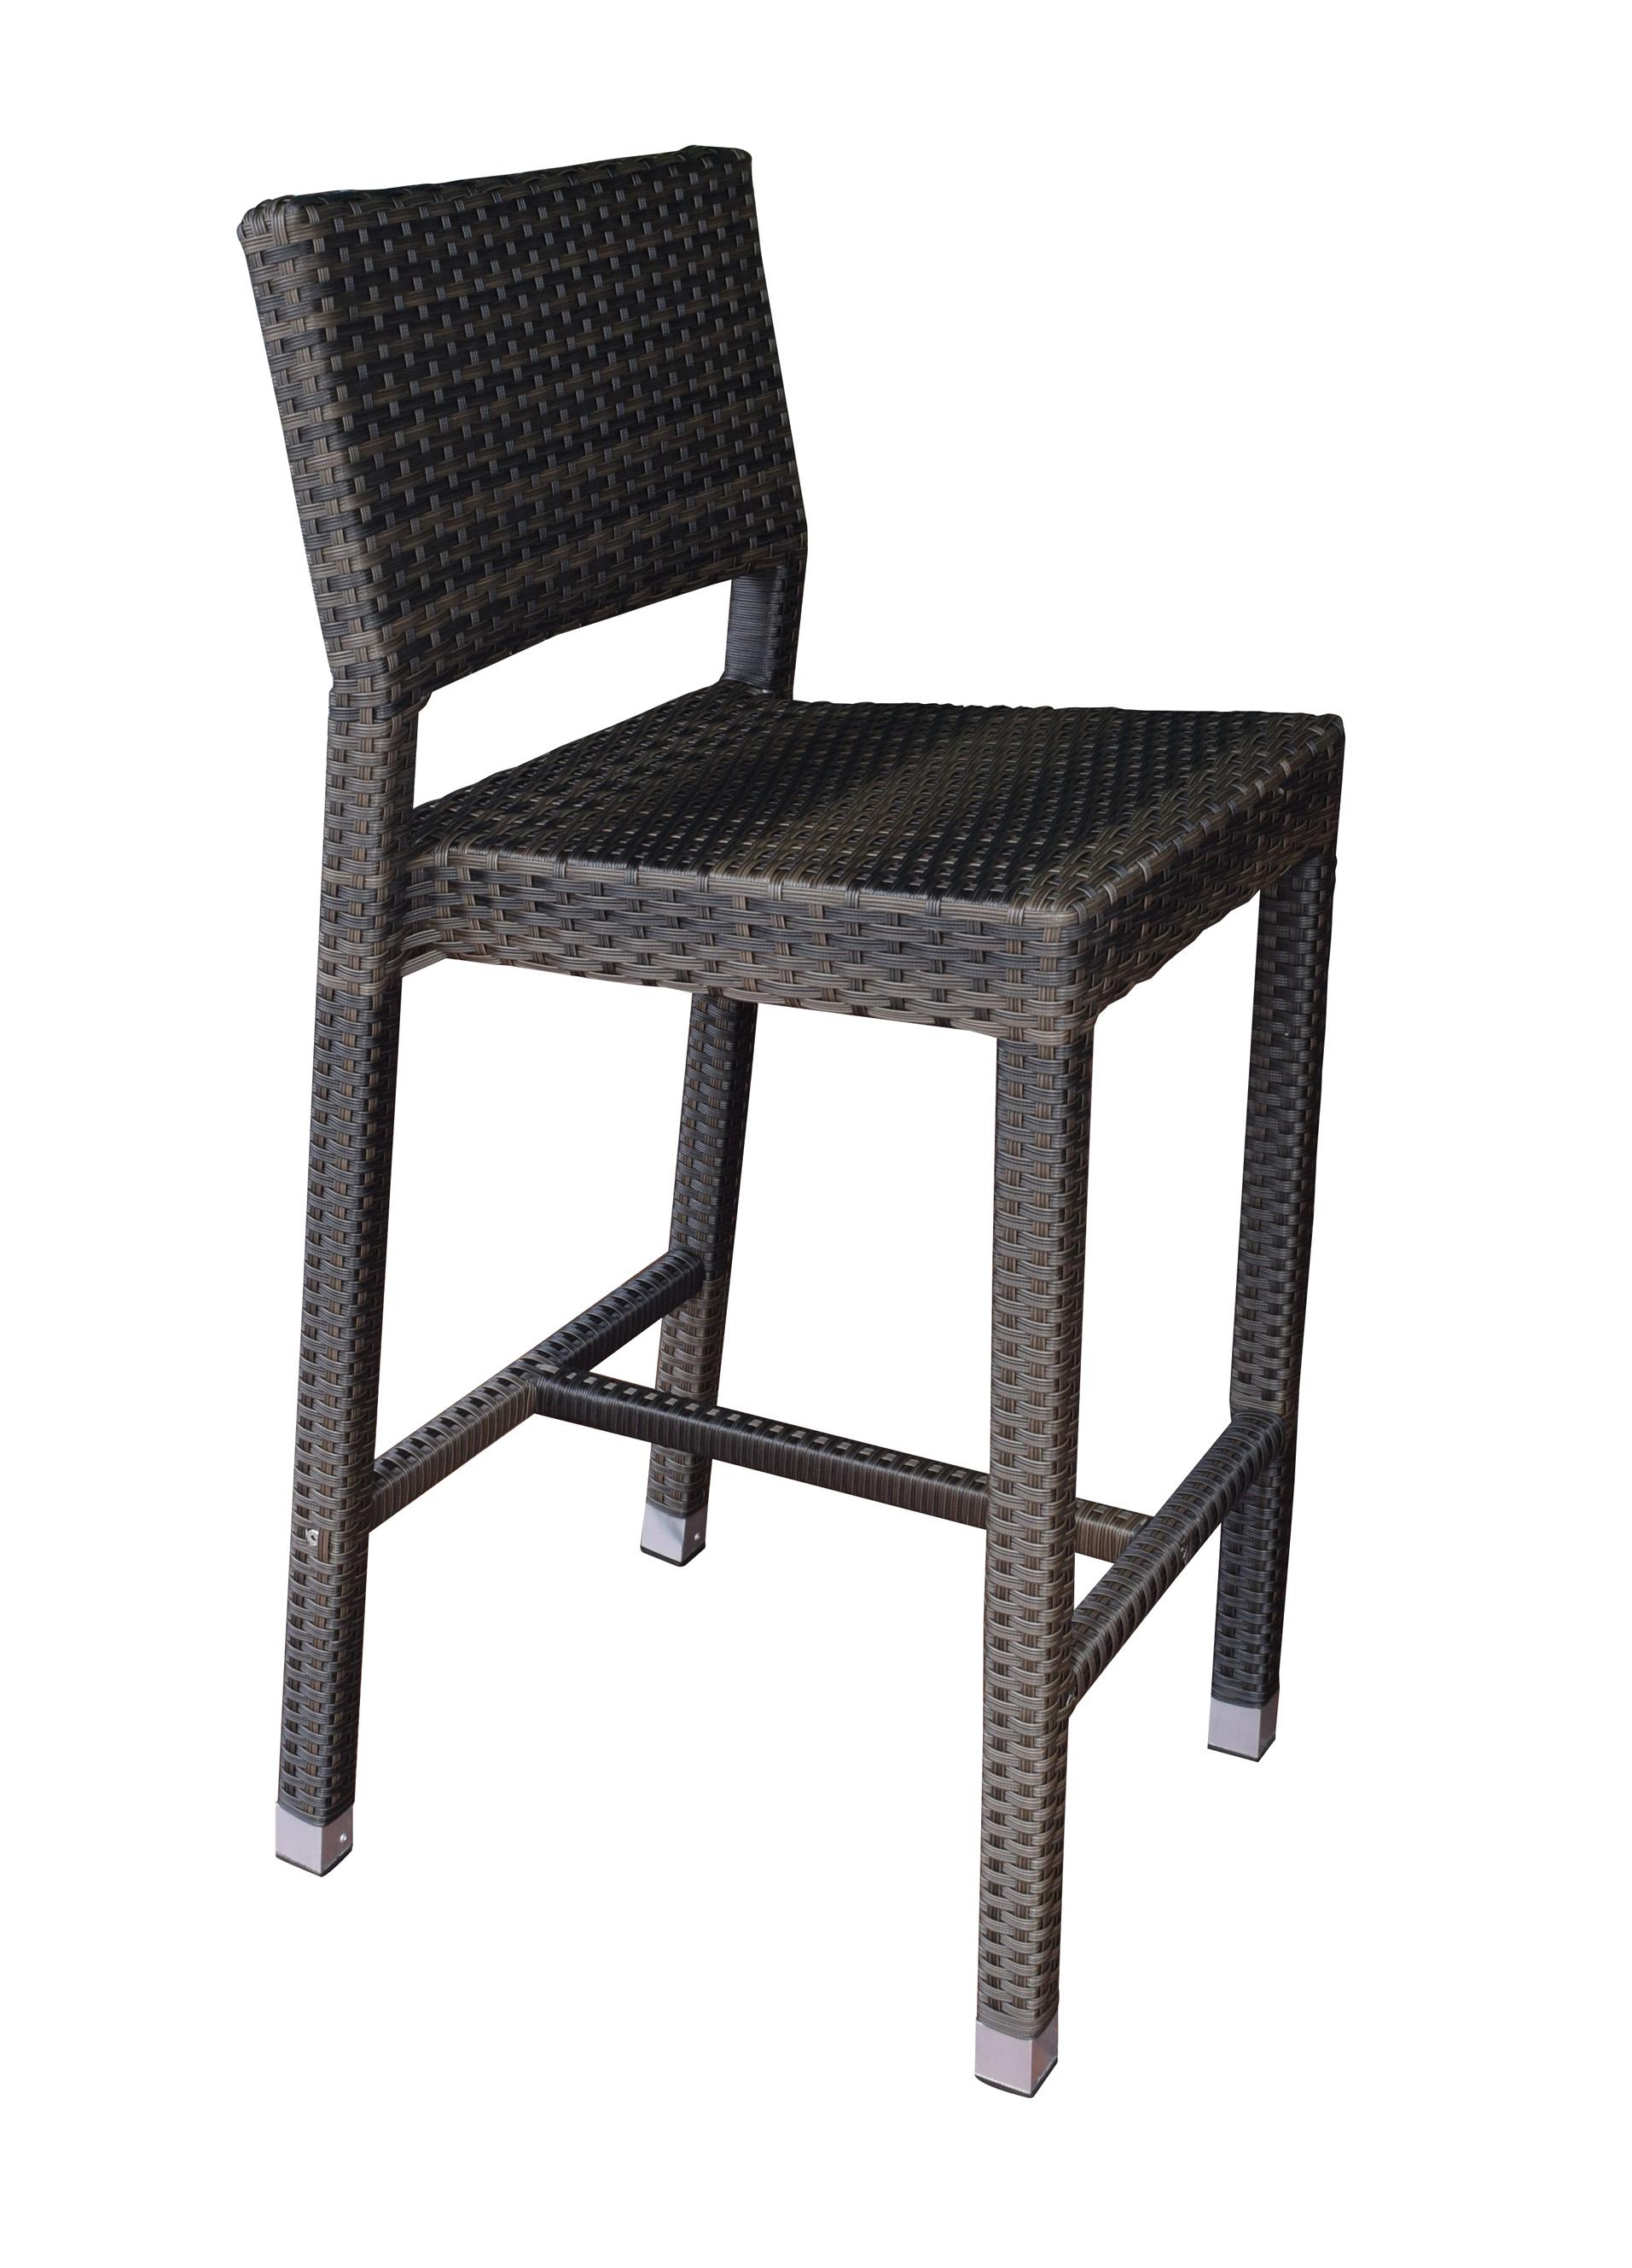 Silla jakarta muebles de jard n terraza o patio exteria for Outlet muebles cancun